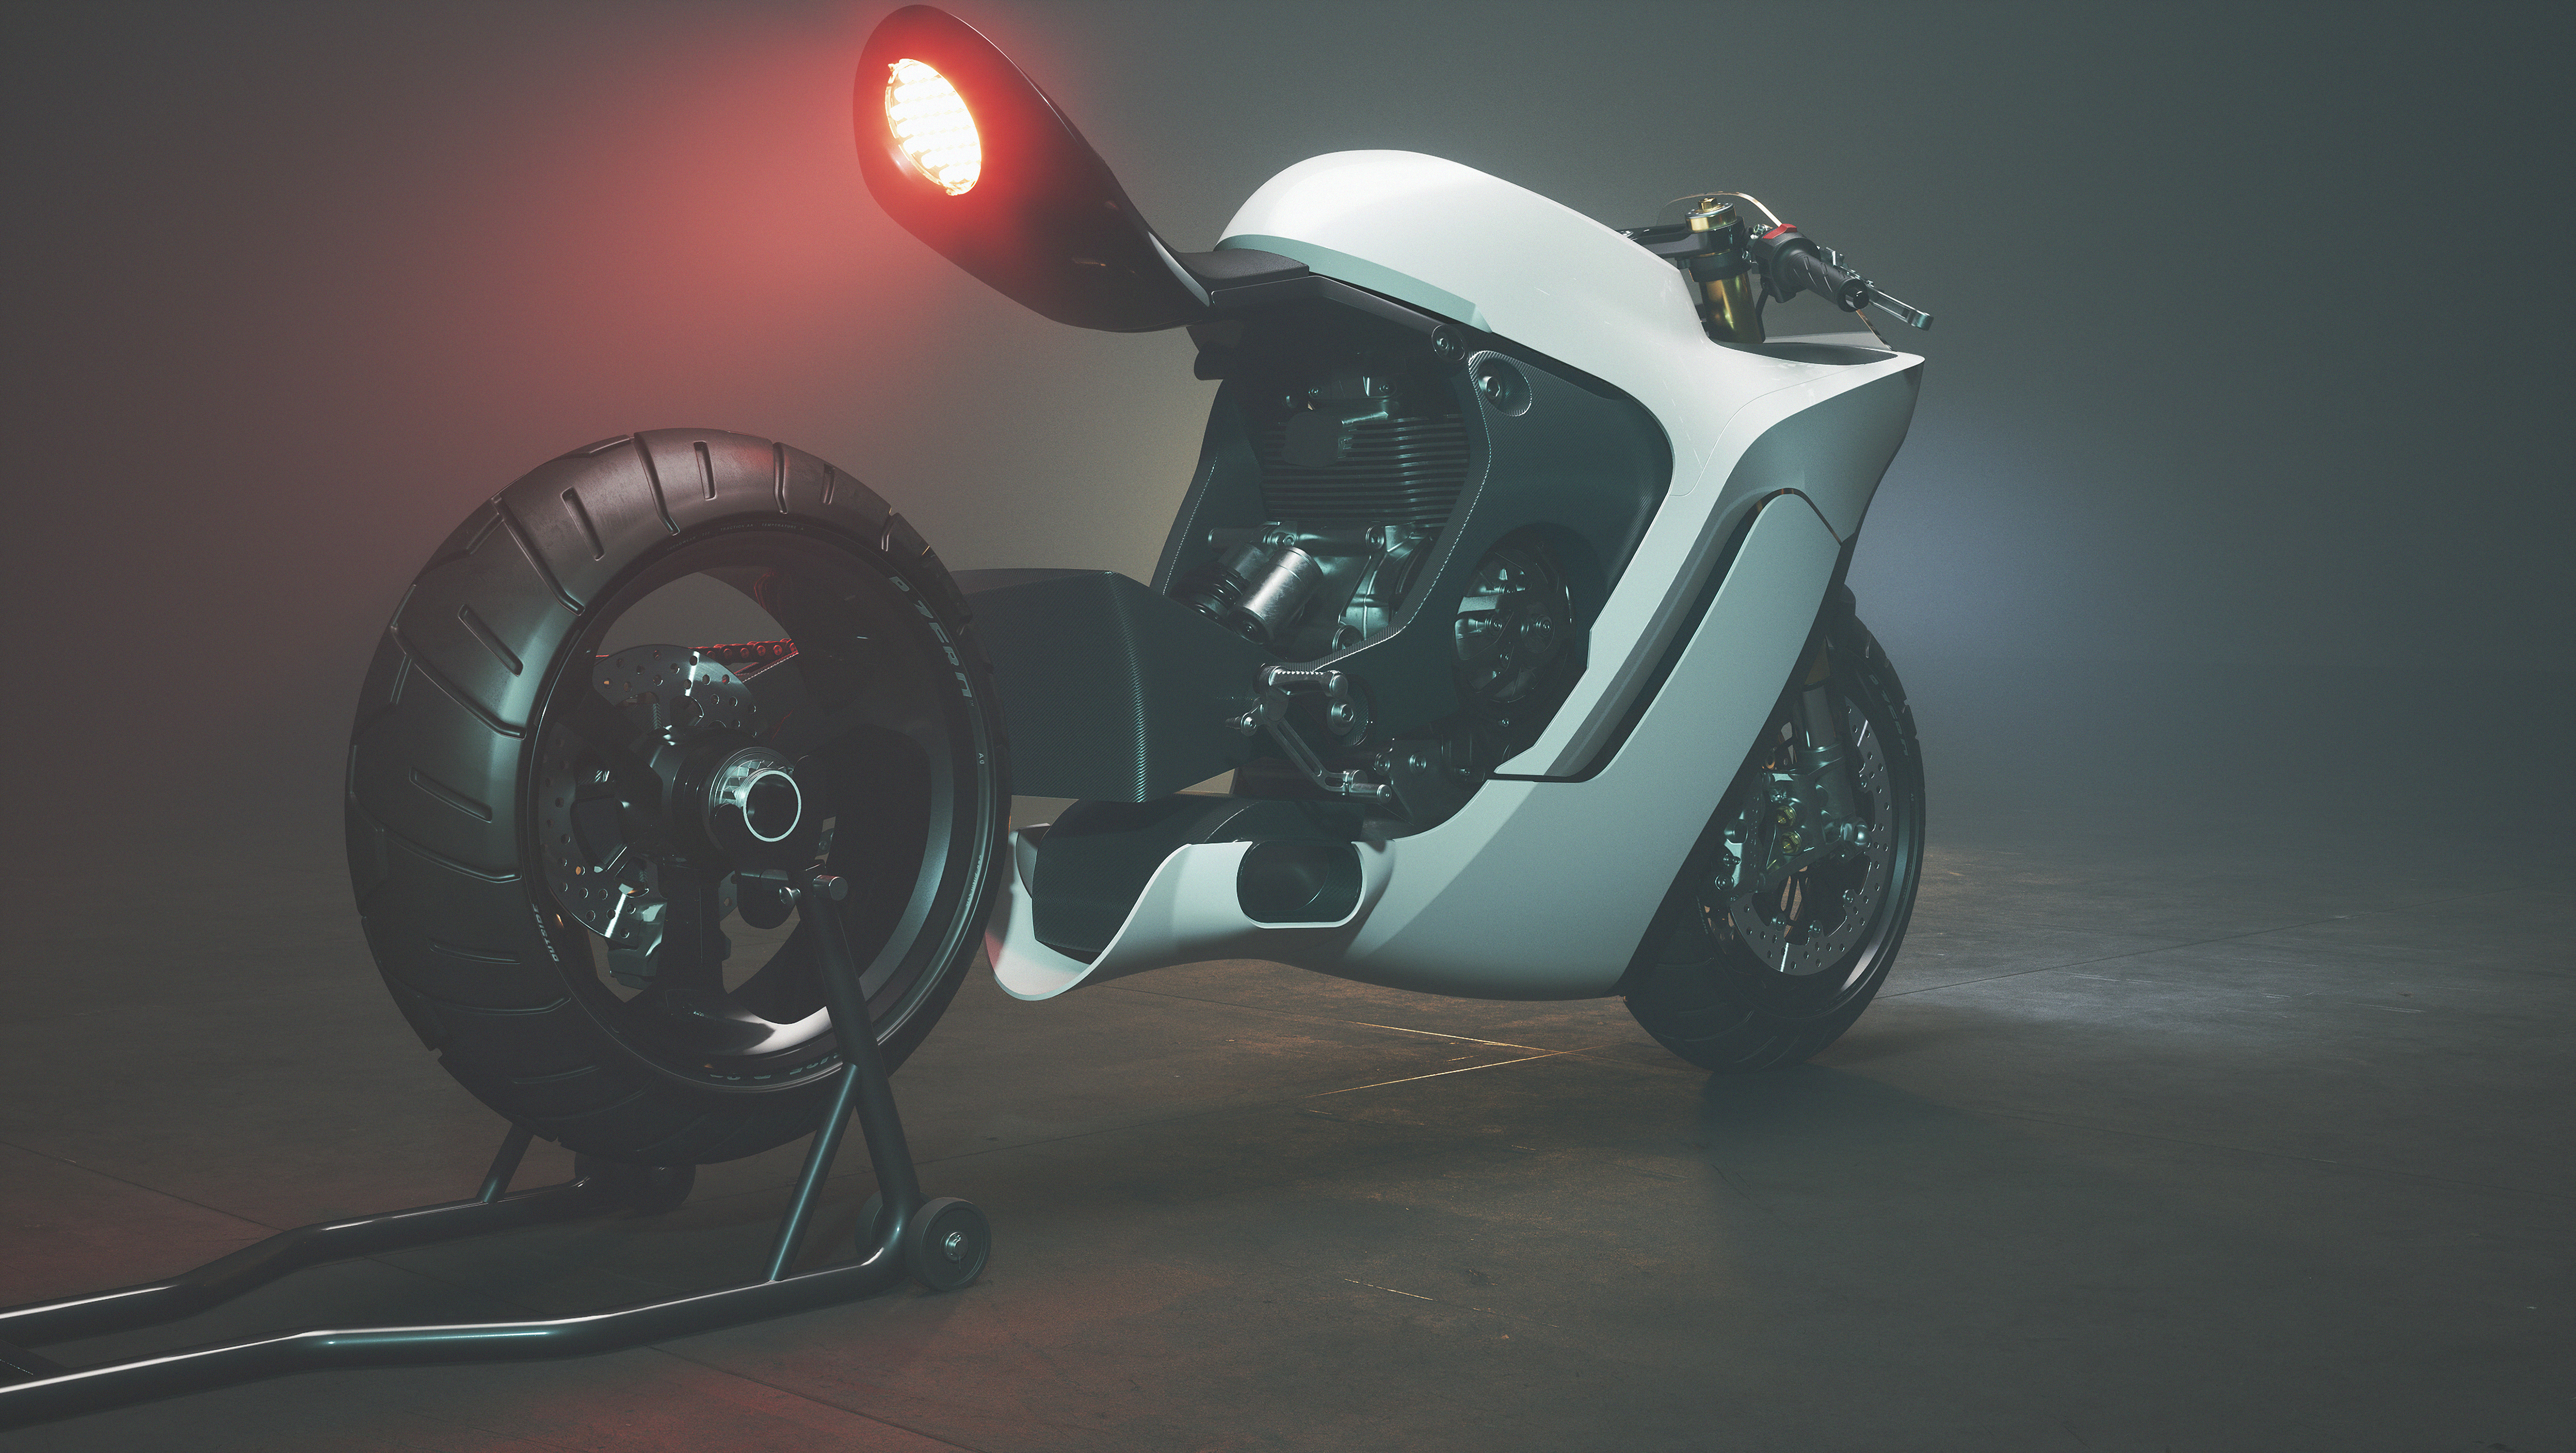 moto racer f strom cgi 4k 1616876693 2 - Moto Racer F Strom Cgi 4k - Moto Racer F Strom Cgi 4k wallpapers